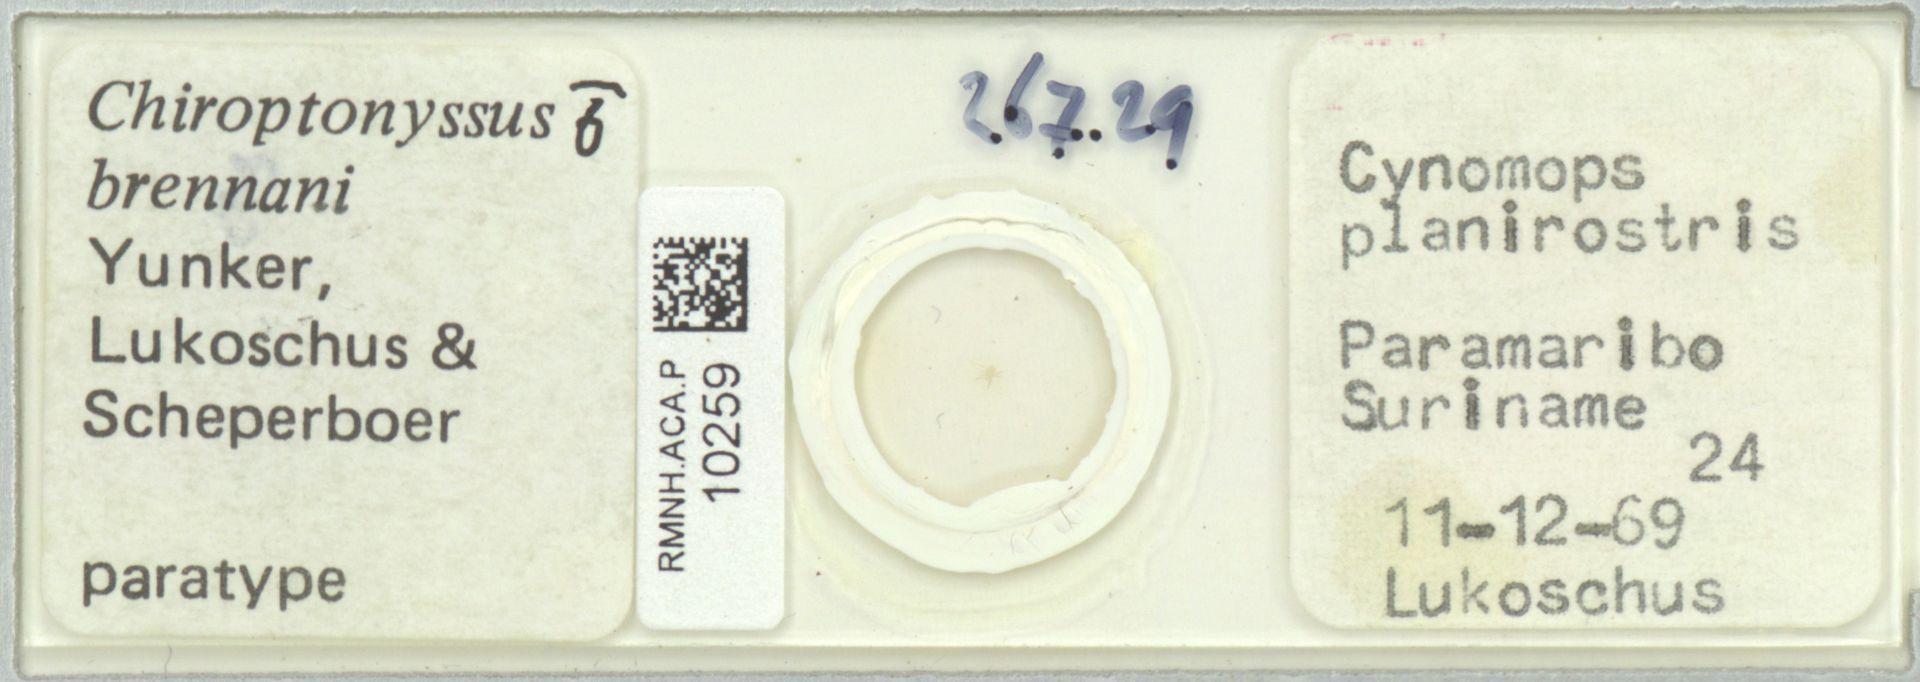 RMNH.ACA.P.10259 | Chiroptonyssus brennani Yunker, Lukoschus & Scheperboer